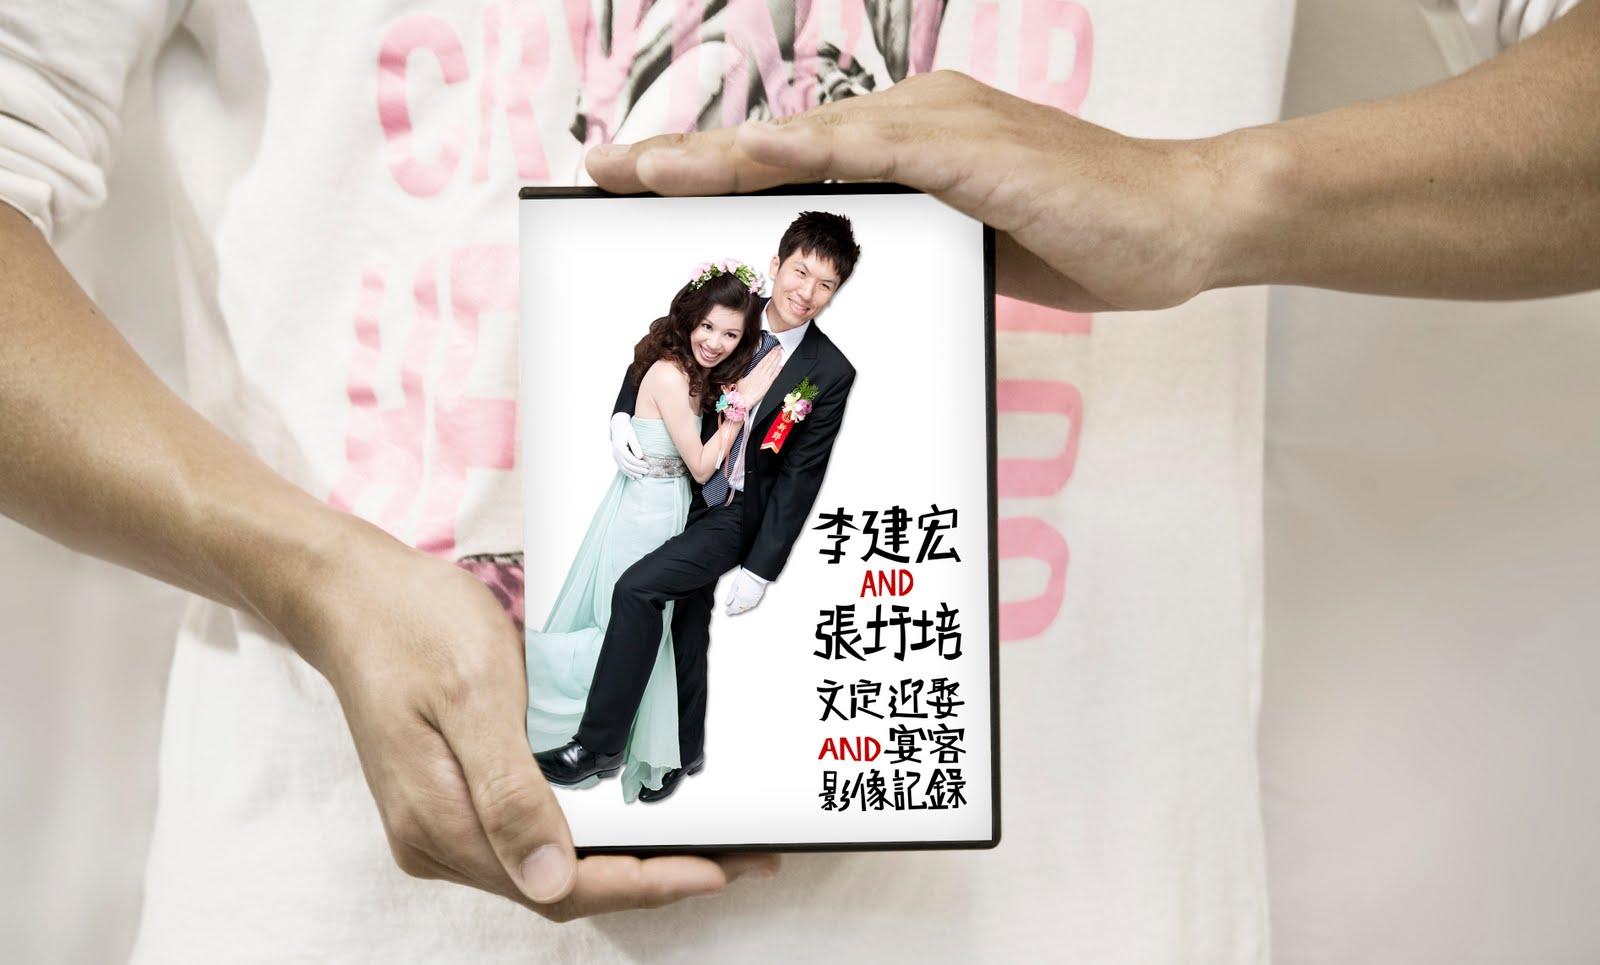 Showcase作品展示 | 建宏X圩培婚攝DVD封面設計 by MUMULab.com